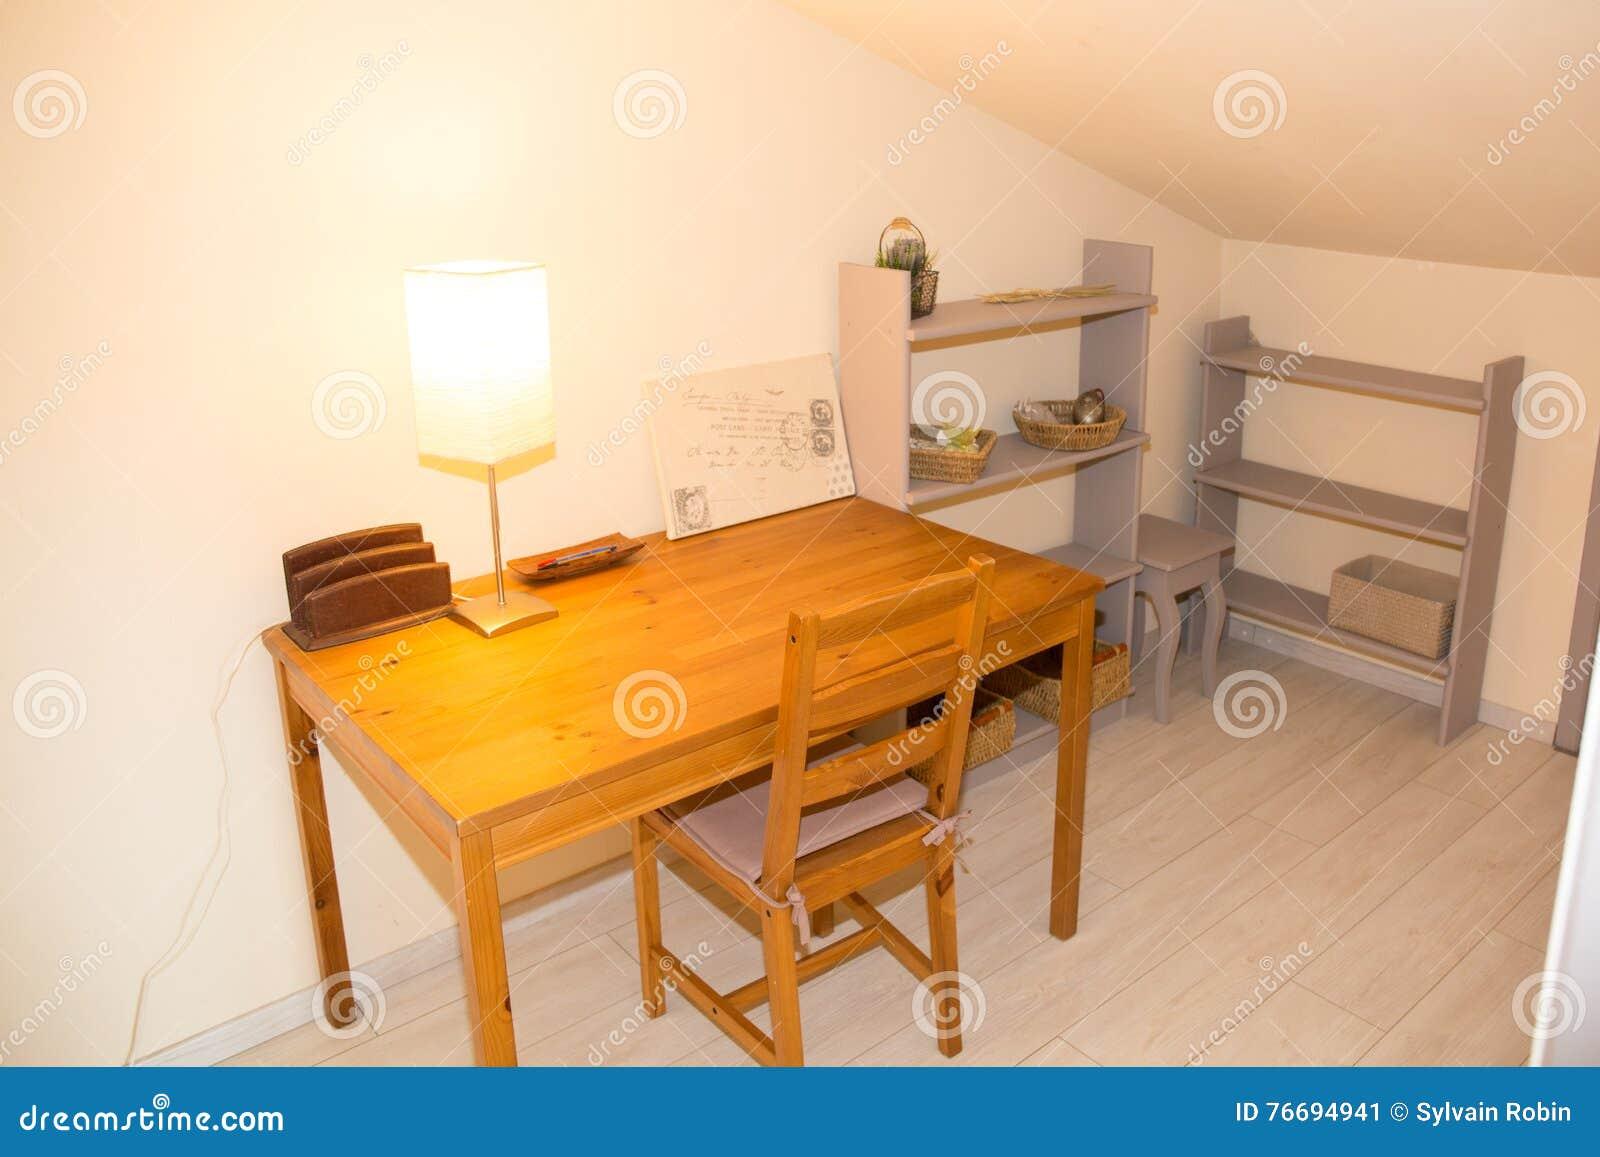 Atelier bureau idéal pour ma petite entreprise à domicile u ma